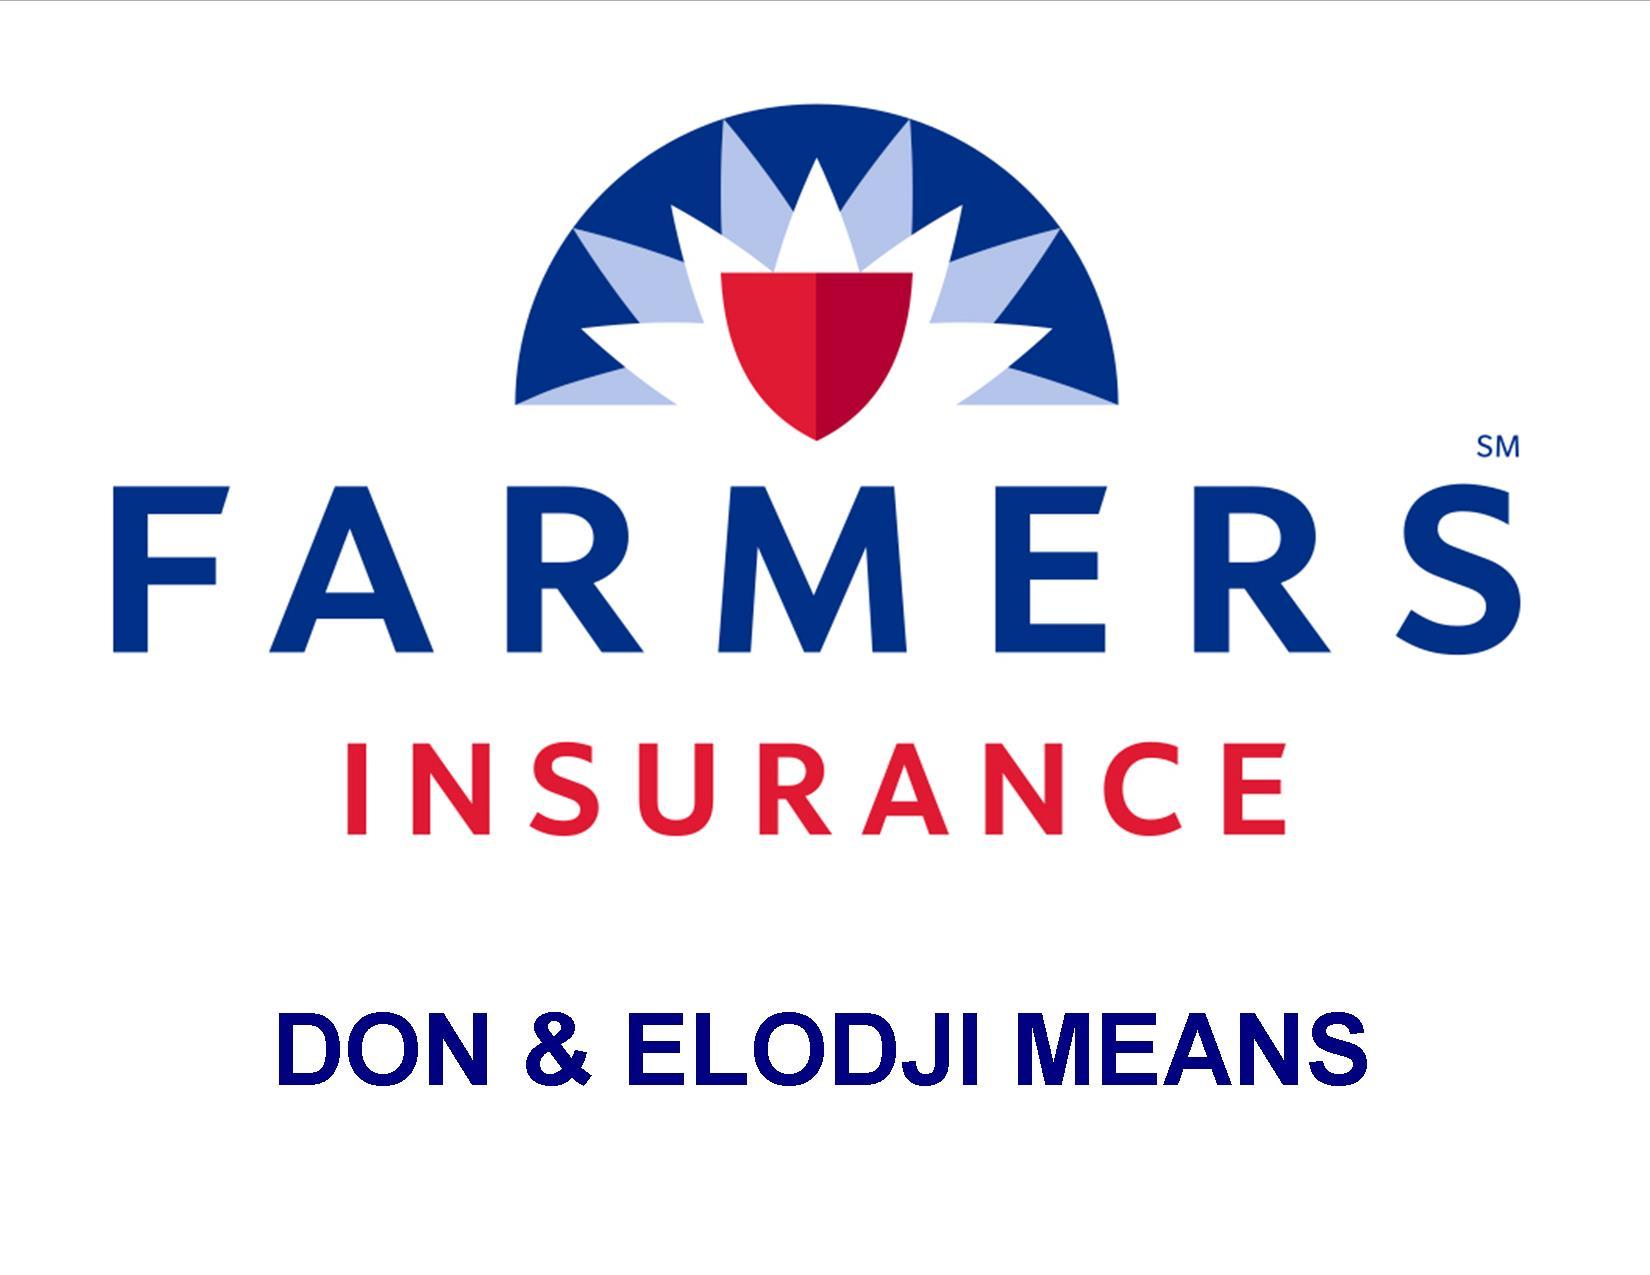 farmers insurance logos  logos discovery engine